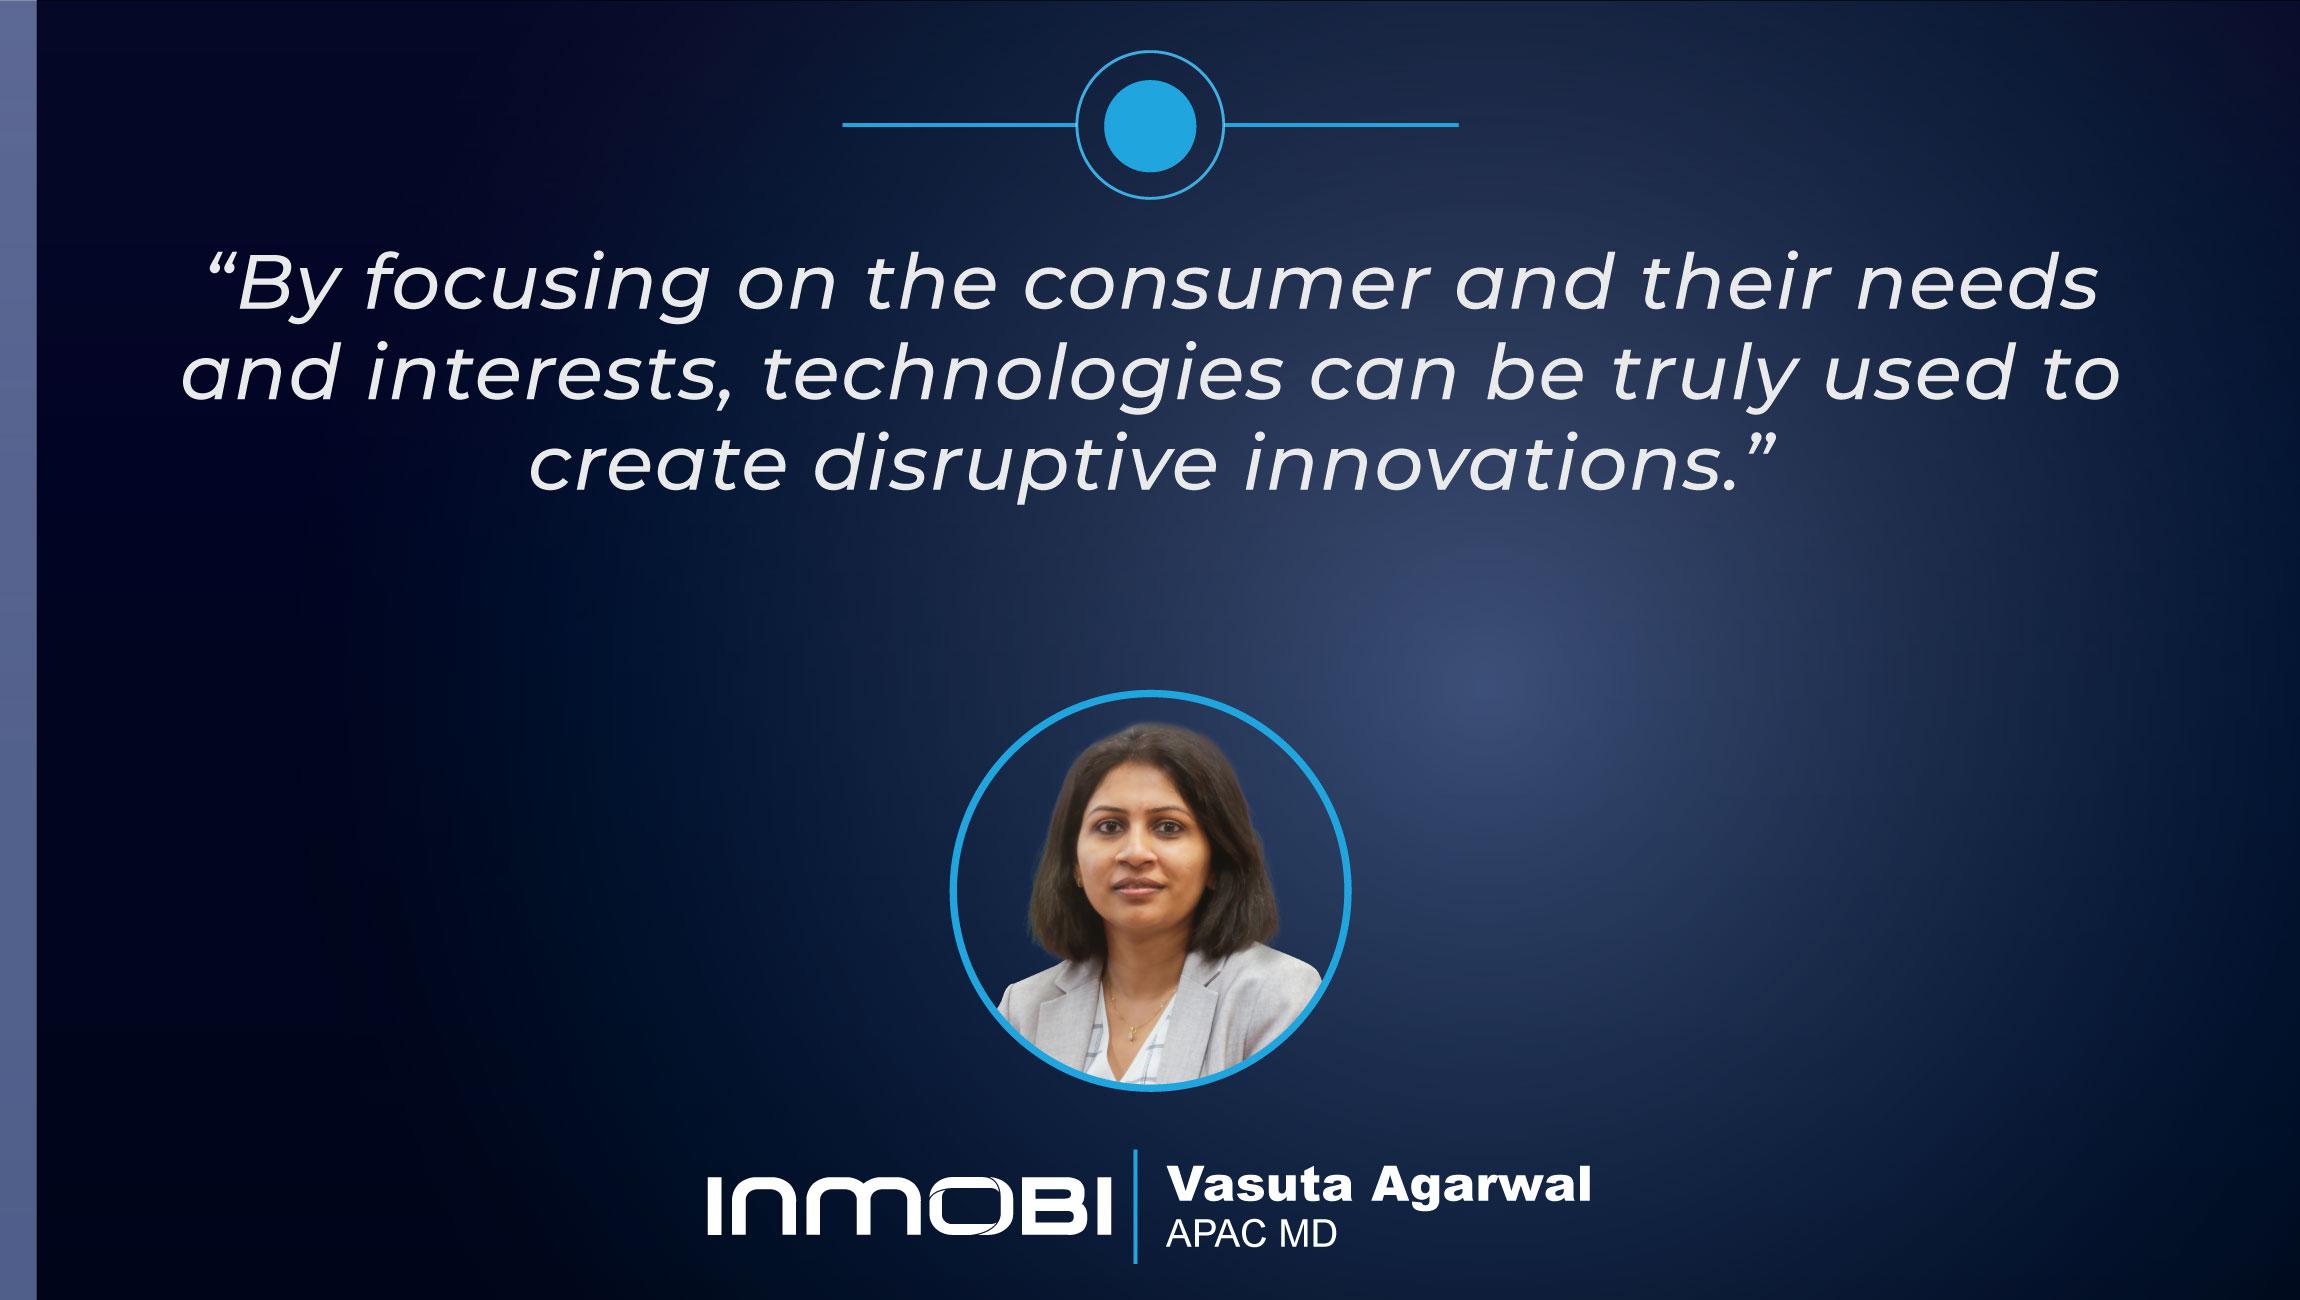 TechBytes with Vasuta Agarwal, Managing Director, Asia Pacific at InMobi